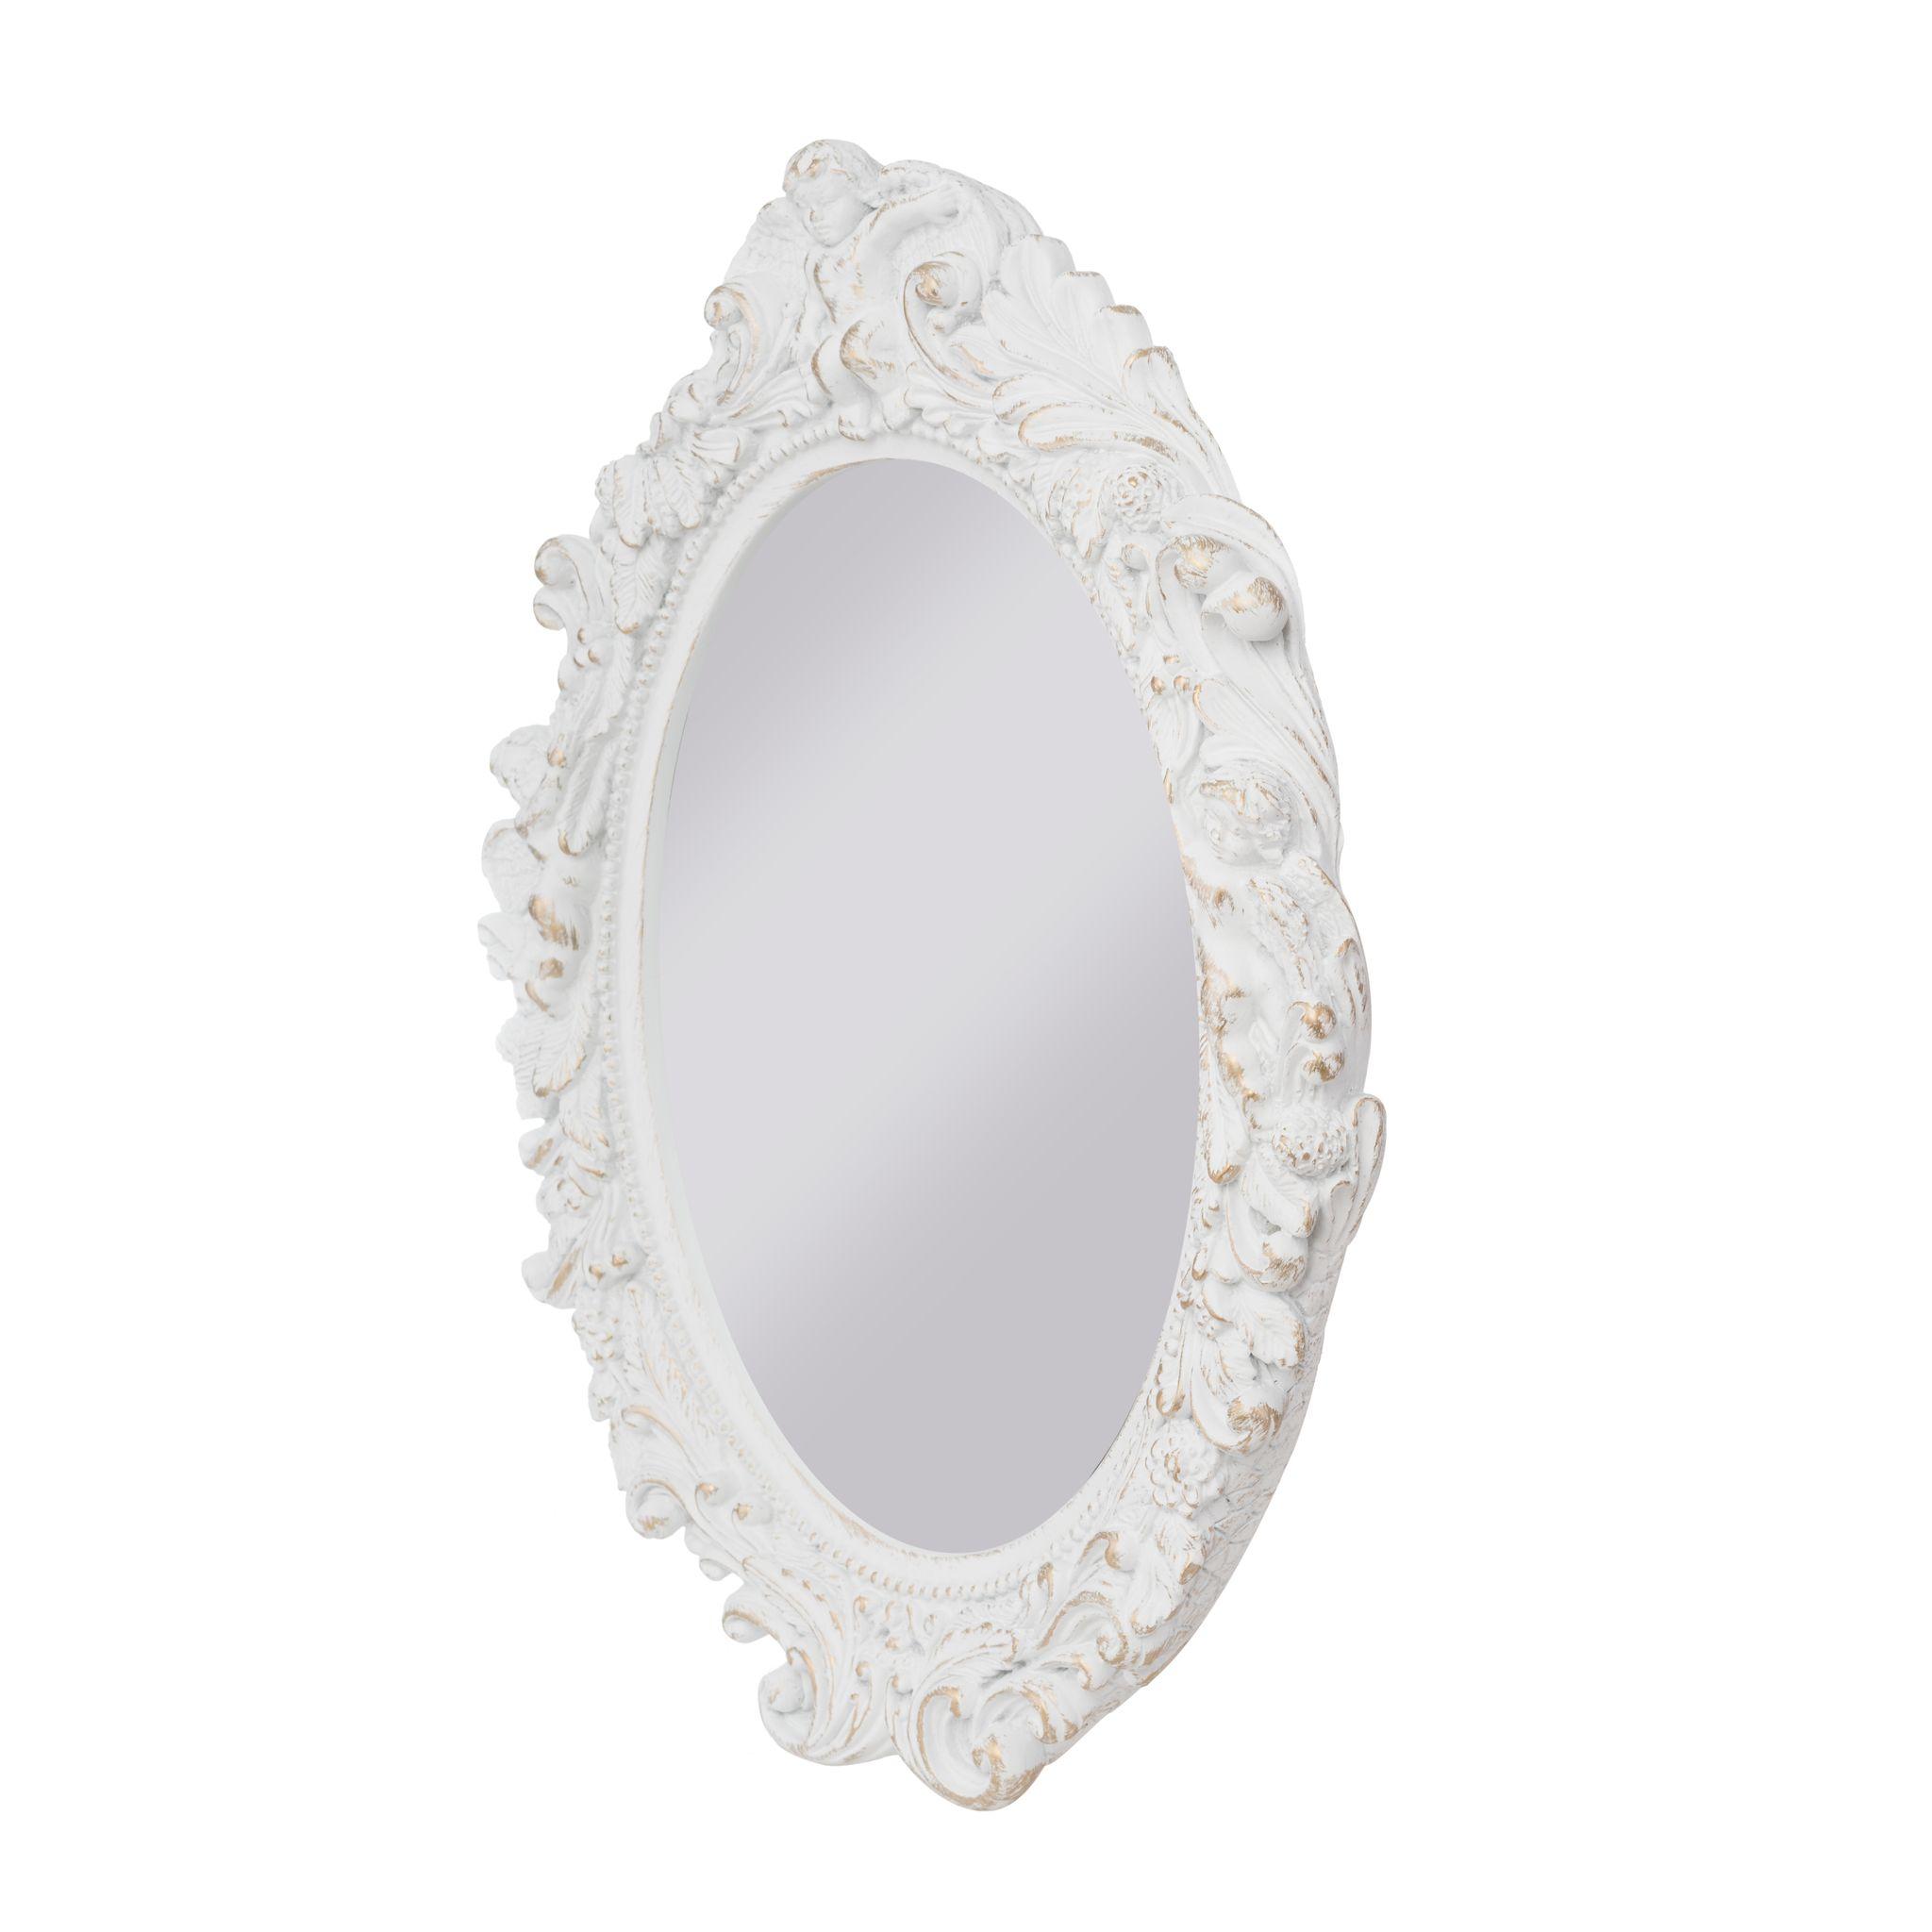 spiegel oval barock wei wandspiegel elbm bel. Black Bedroom Furniture Sets. Home Design Ideas